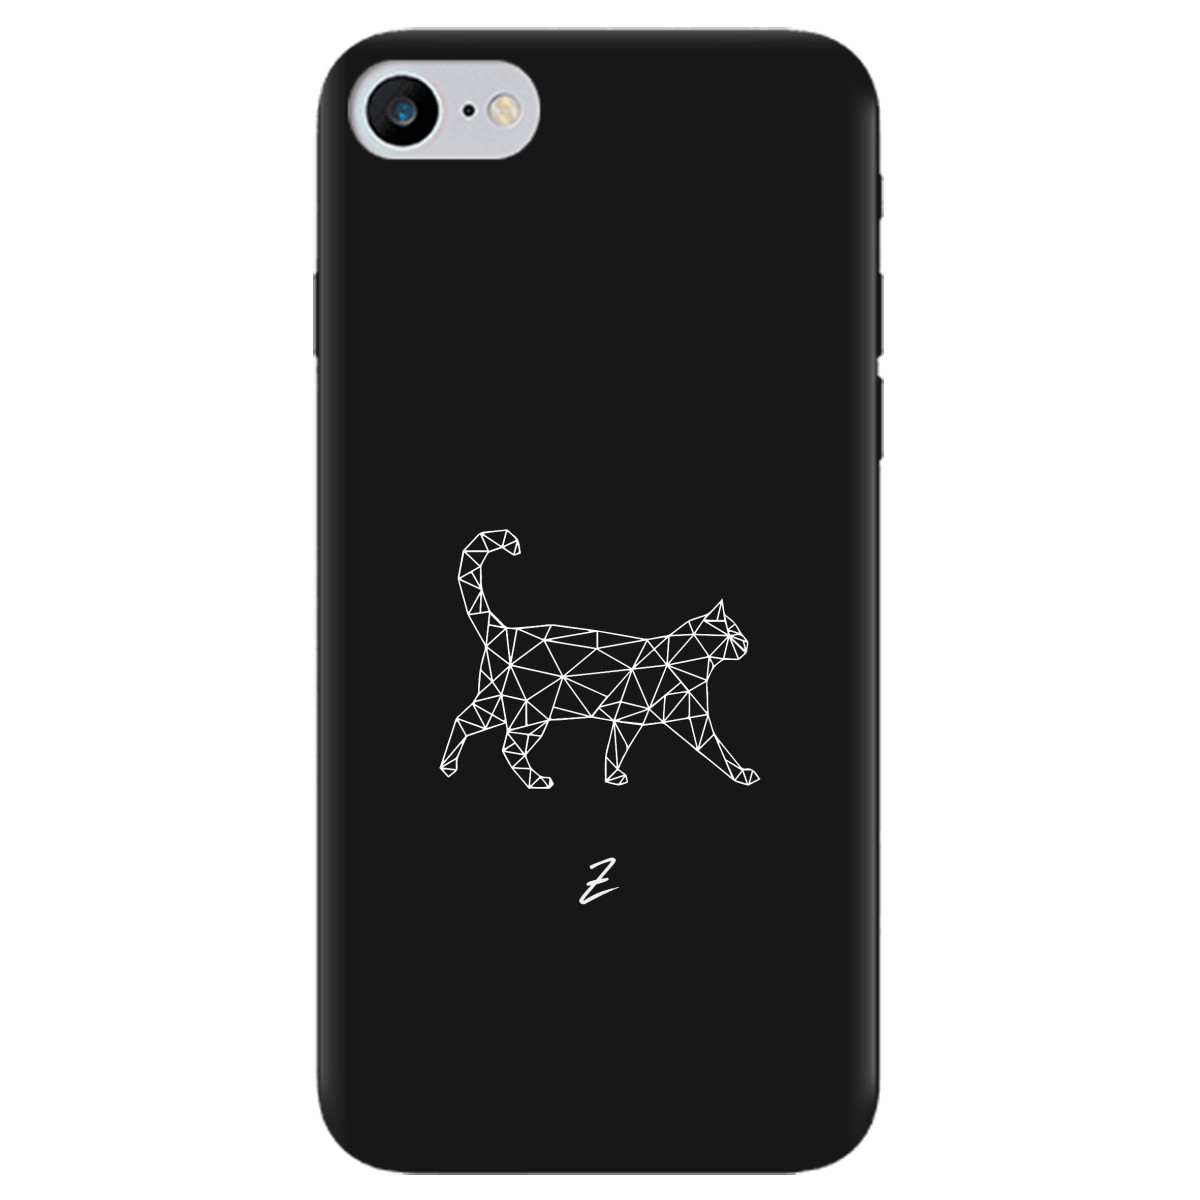 Чохол для Apple iPhone 7 чорний матовий soft touch White cat